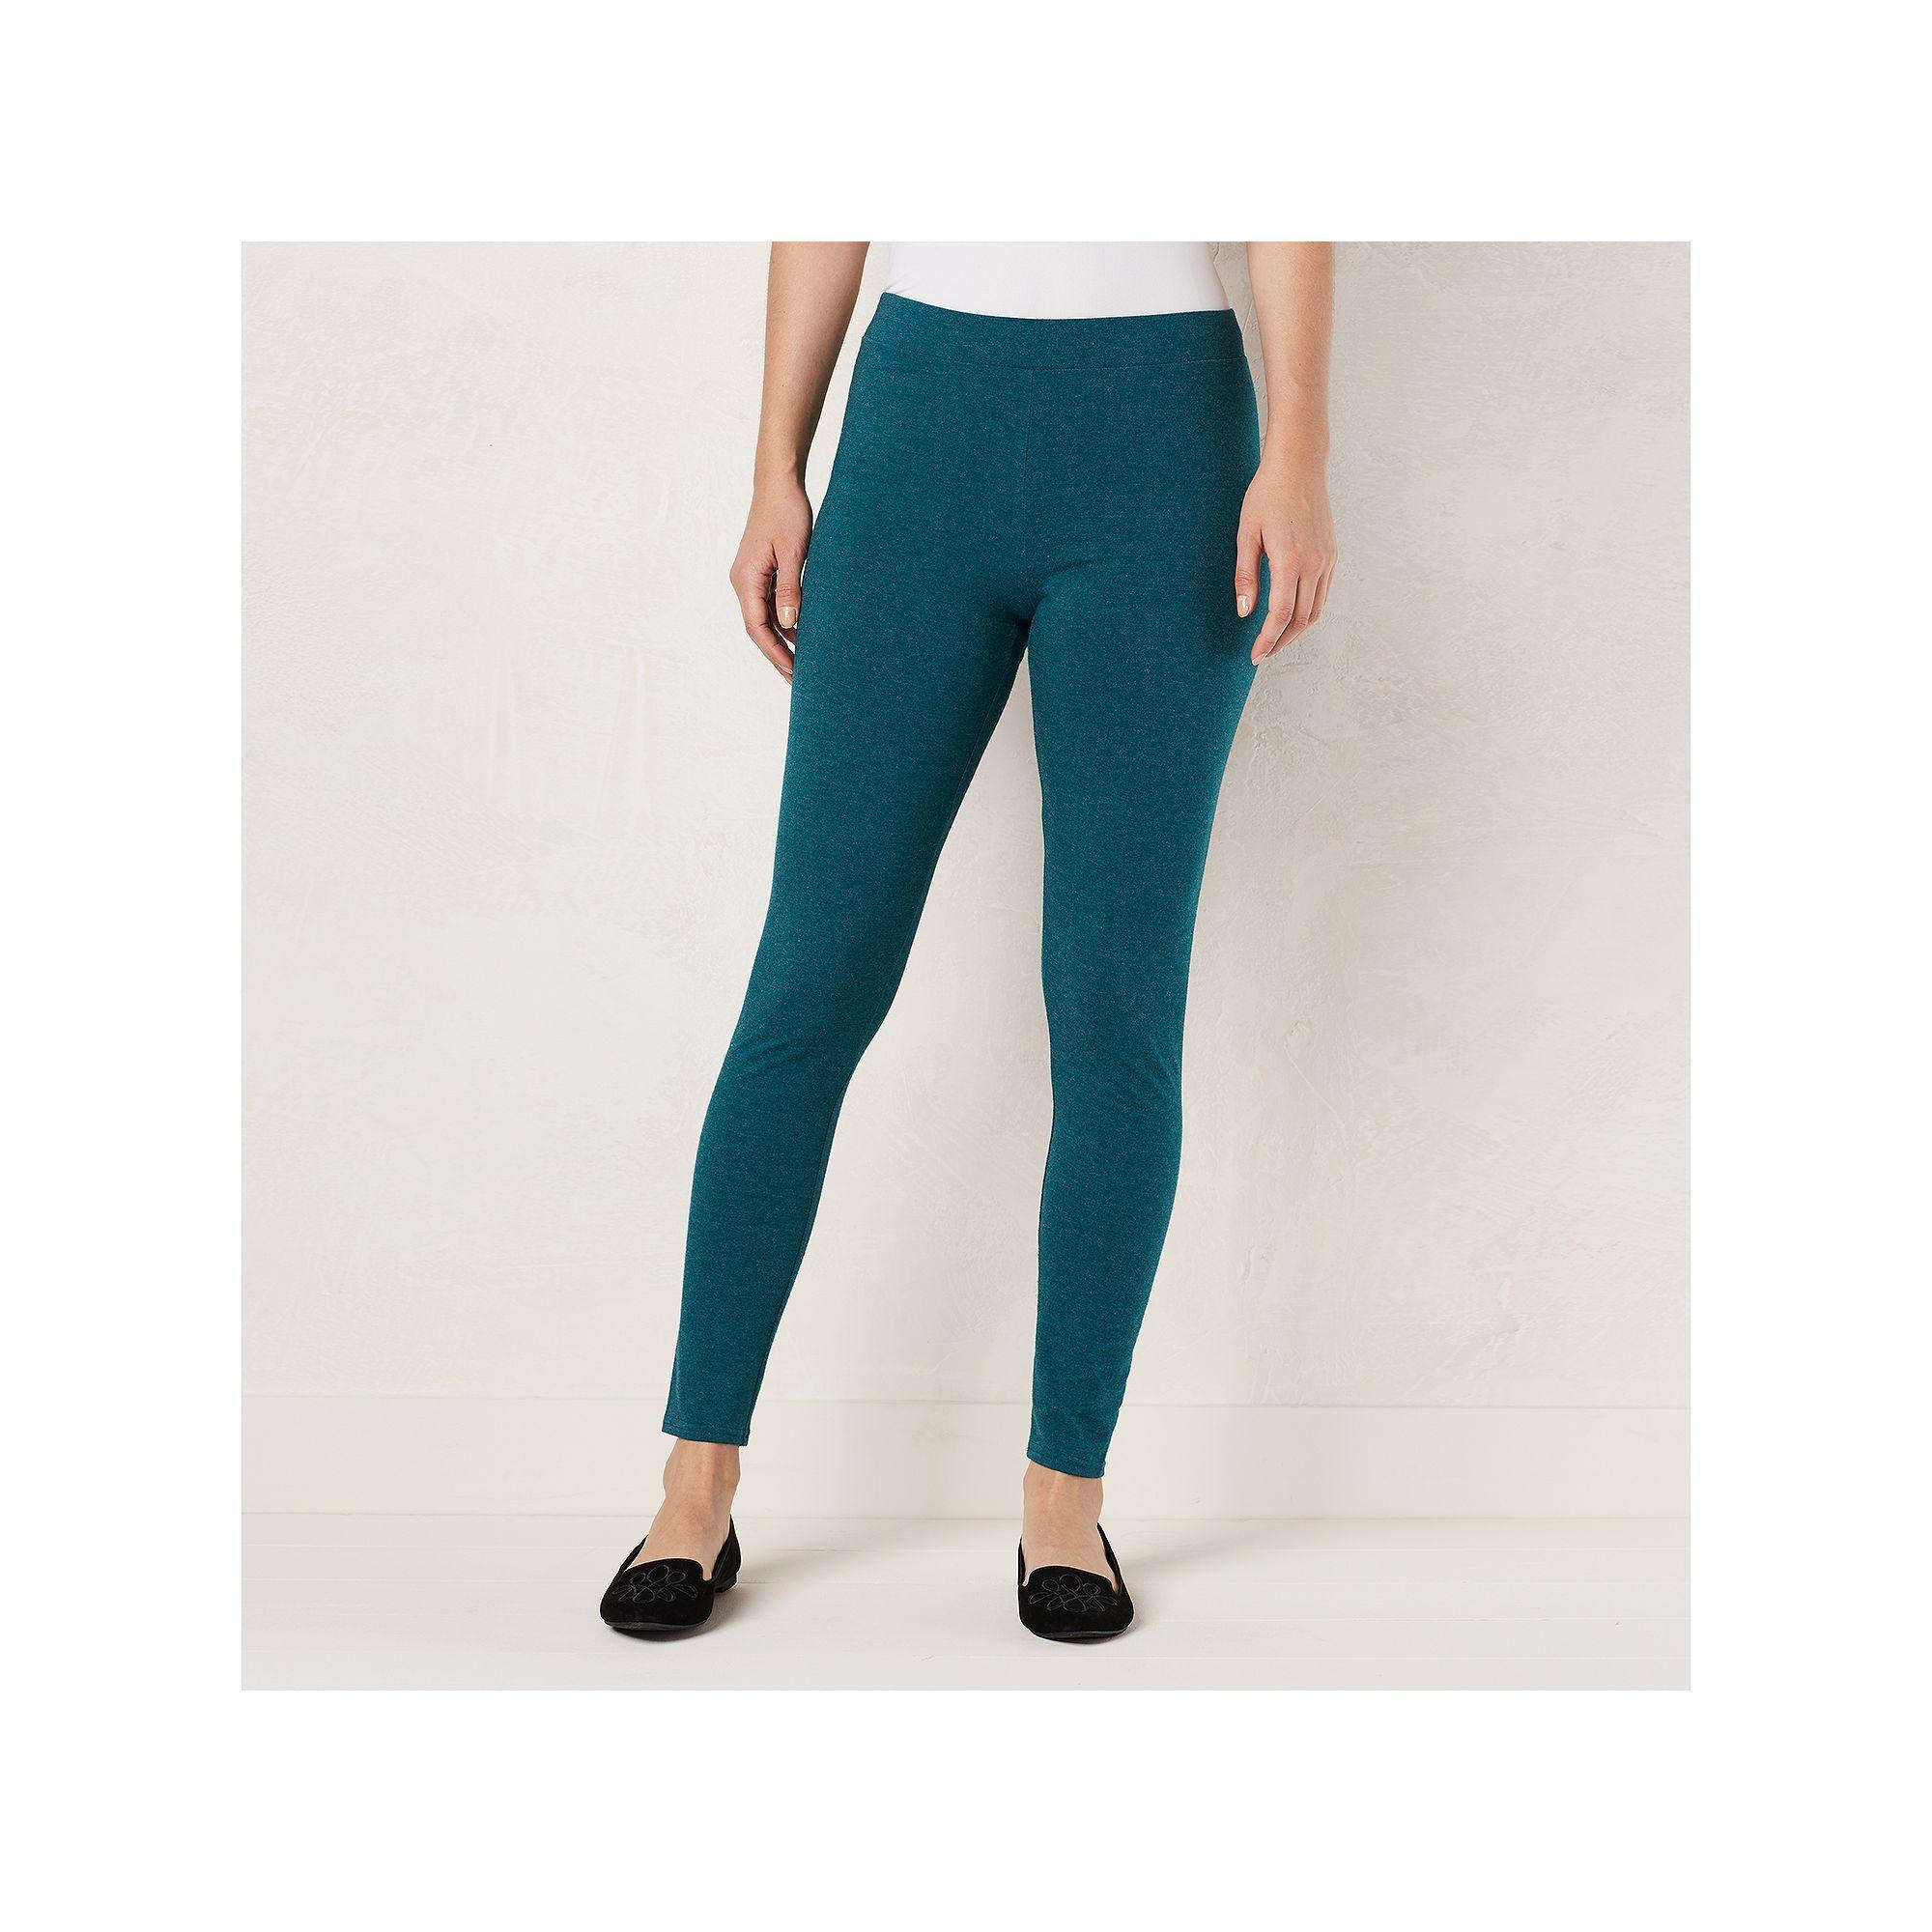 7a68918d17d5d Women's LC Lauren Conrad Heathered Legging, Size: Xxl Short, Turquoise/Blue  (Turq/Aqua)